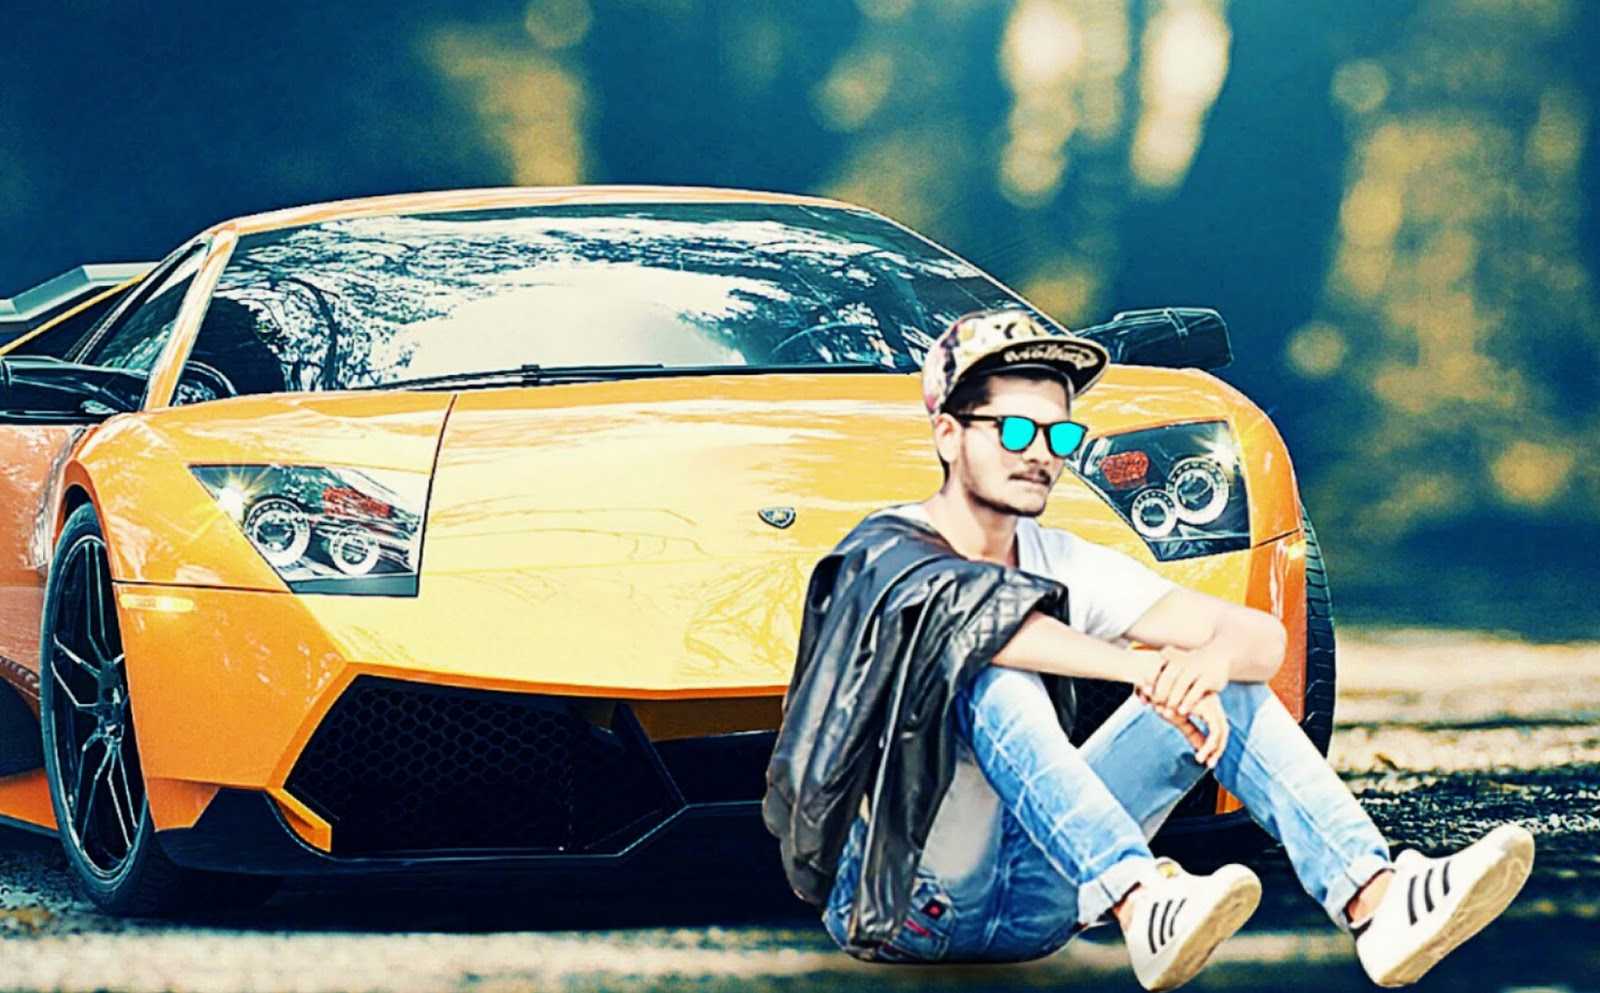 Lamborghini Picsart Background Change By Vaxdan Vaxdan